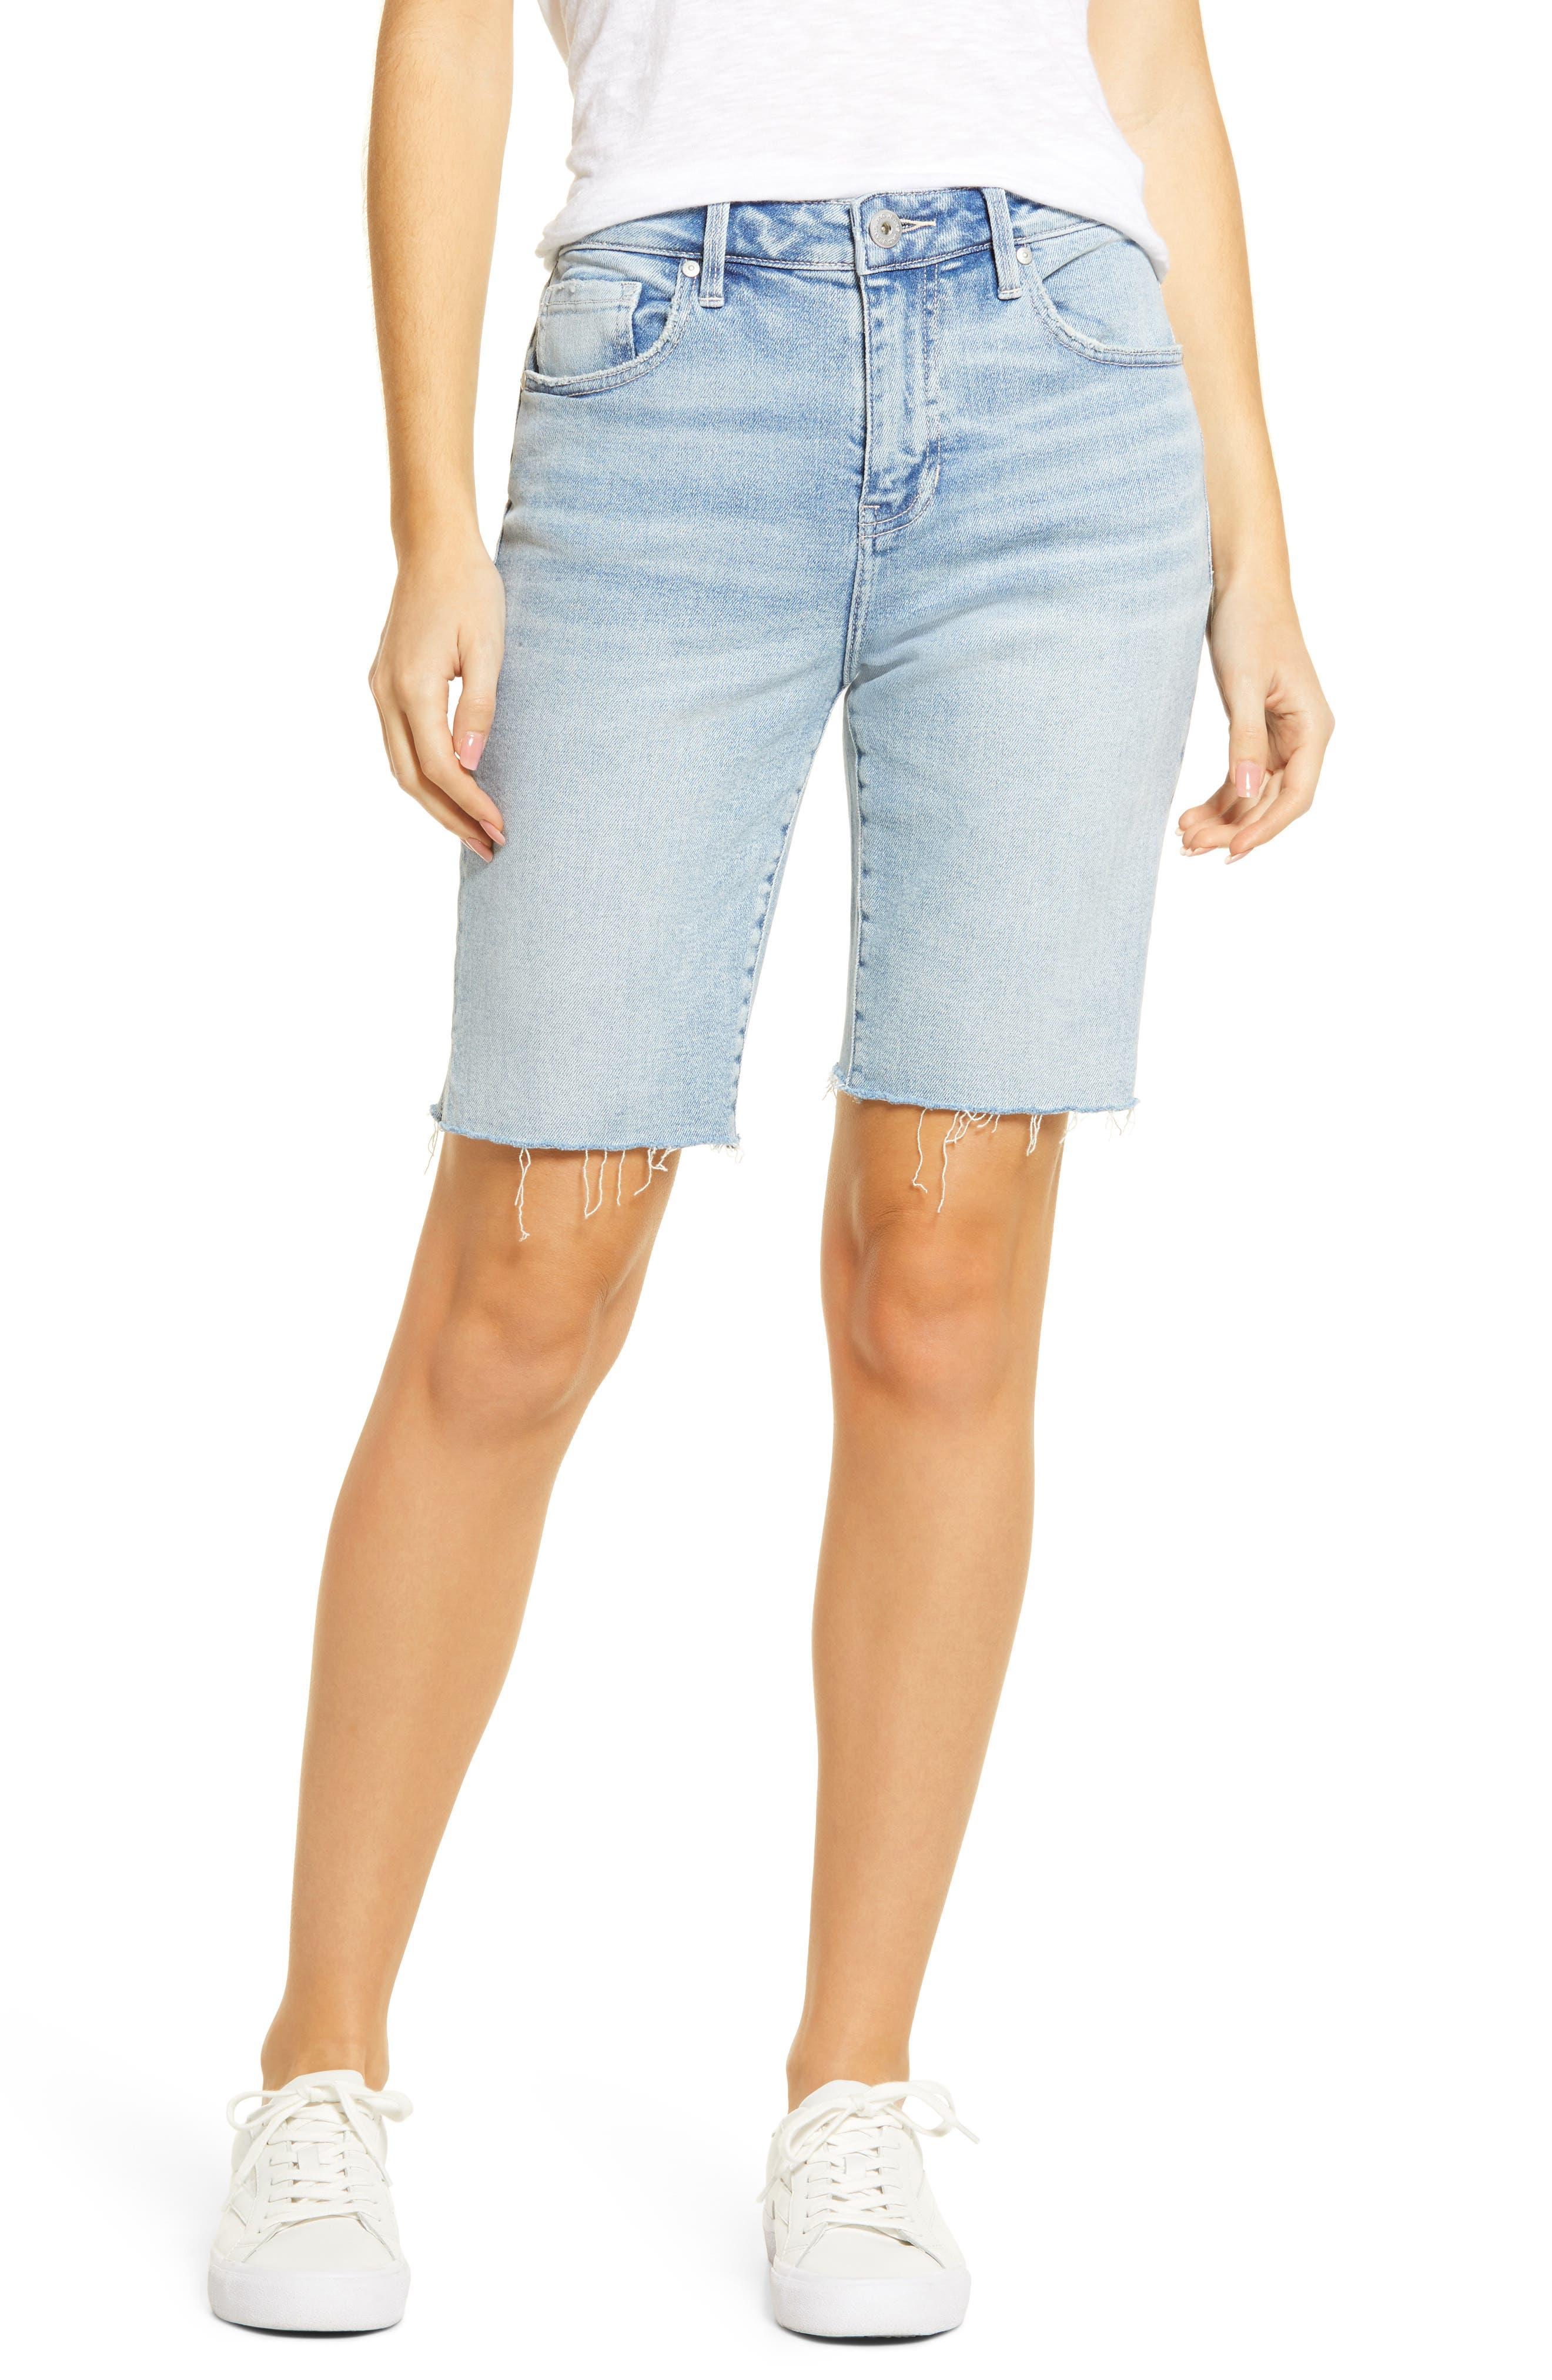 The City Shorts Cutoff Denim Bermuda Shorts